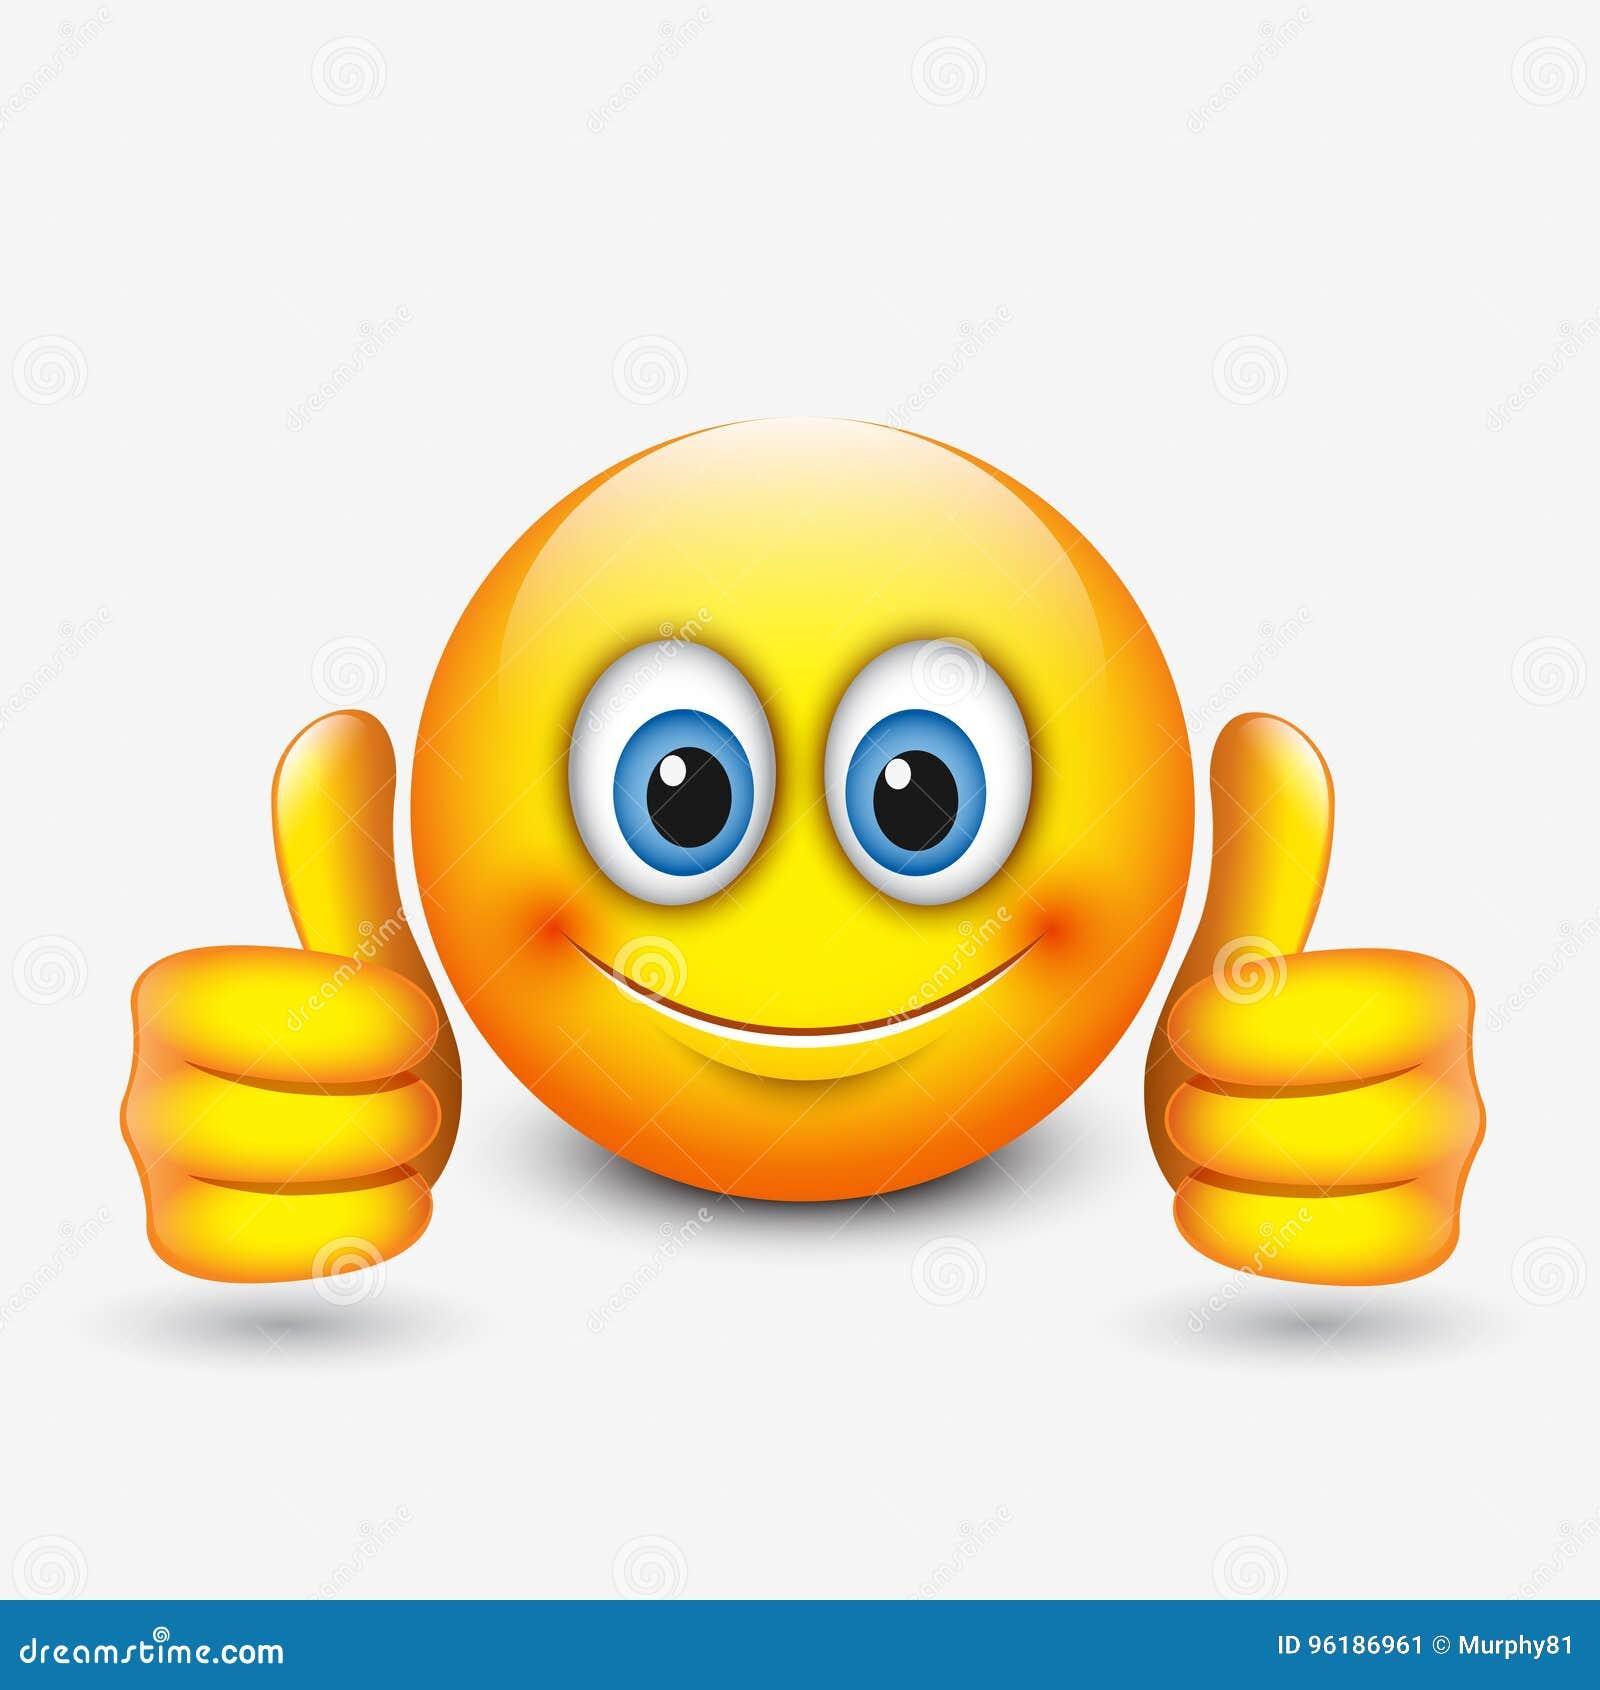 Thumbs Up Emoticon Emoji Vector Illustration ...